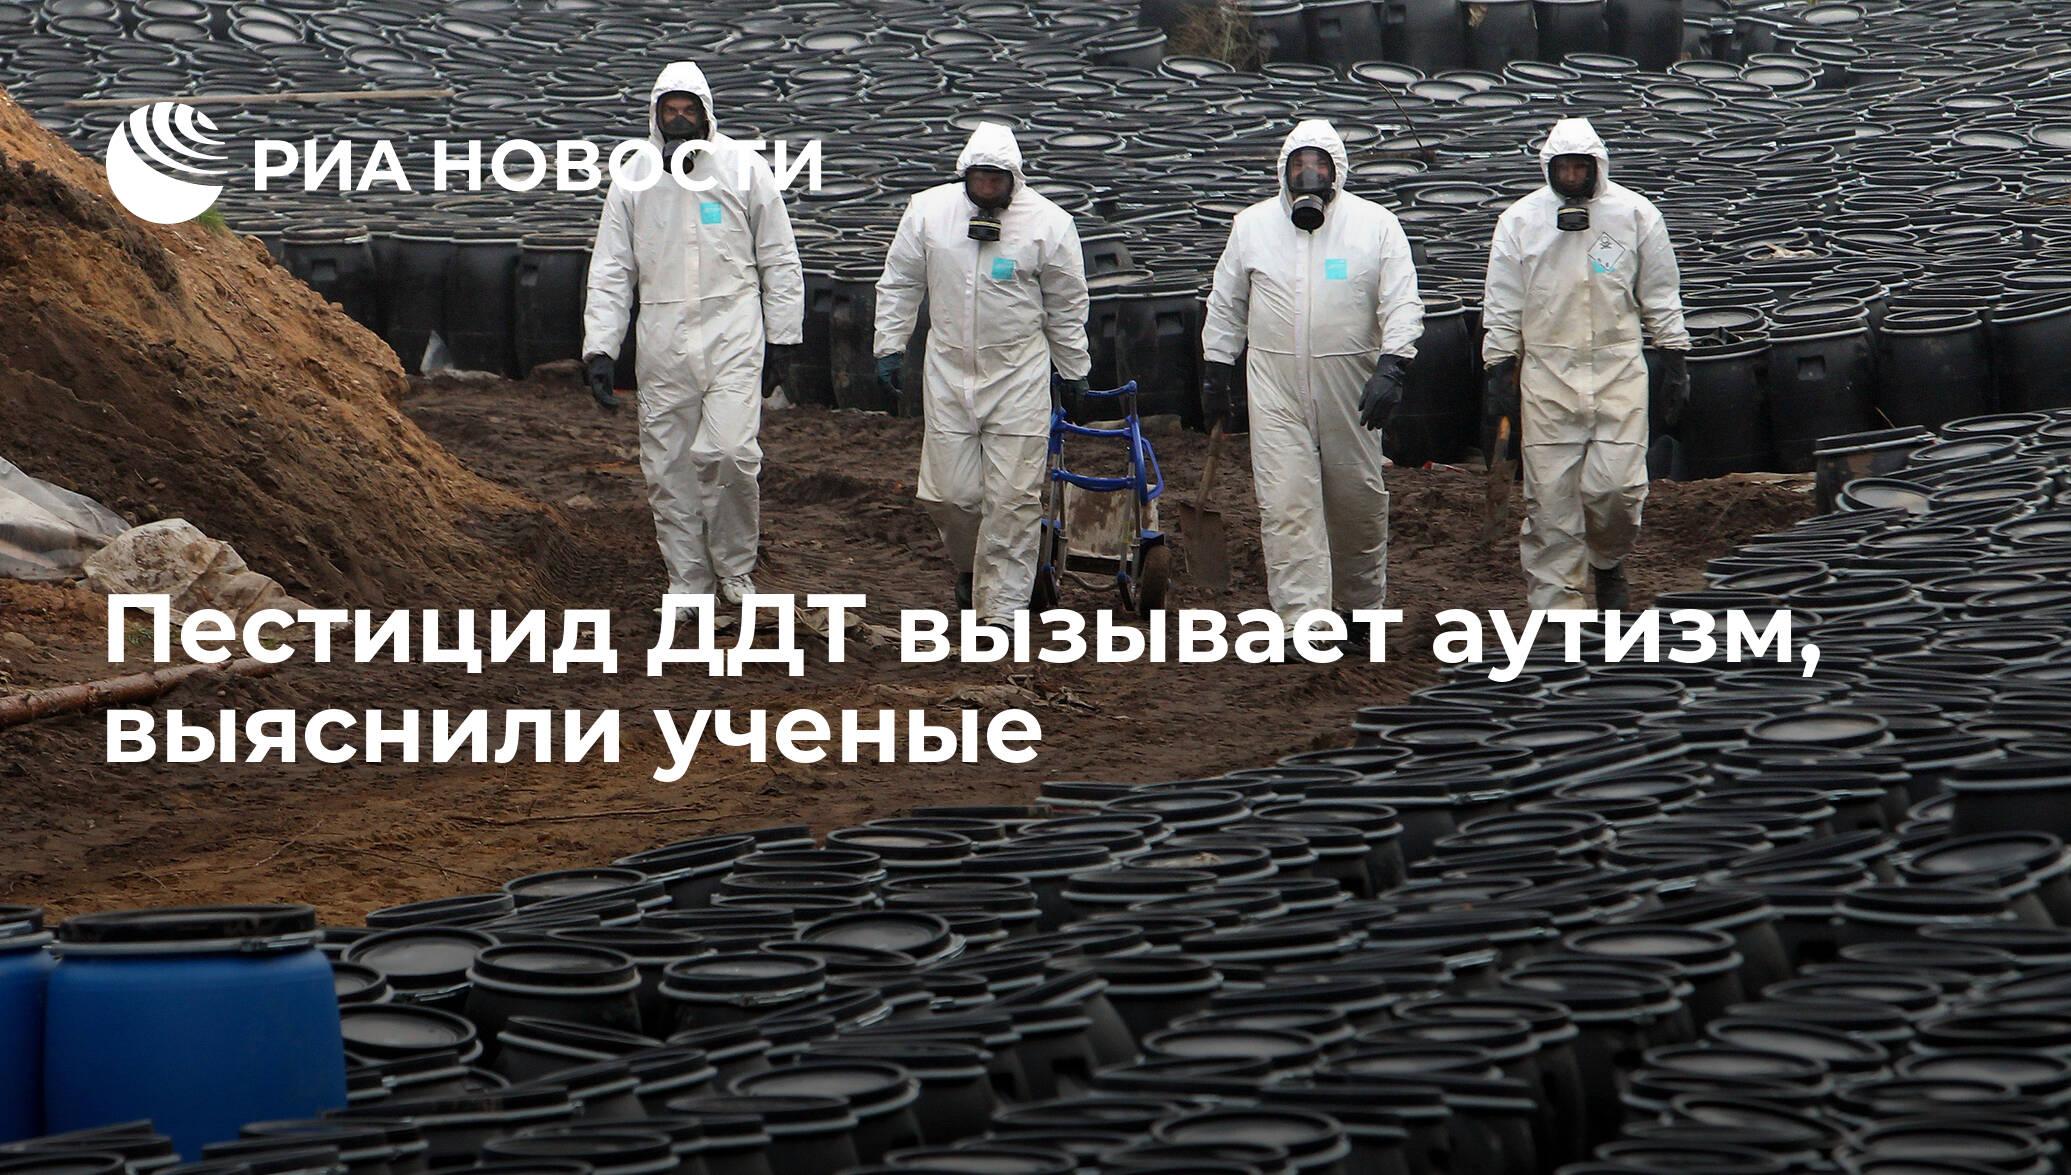 https://cdn24.img.ria.ru/images/sharing/article/1526656879.jpg?4985321141534415845